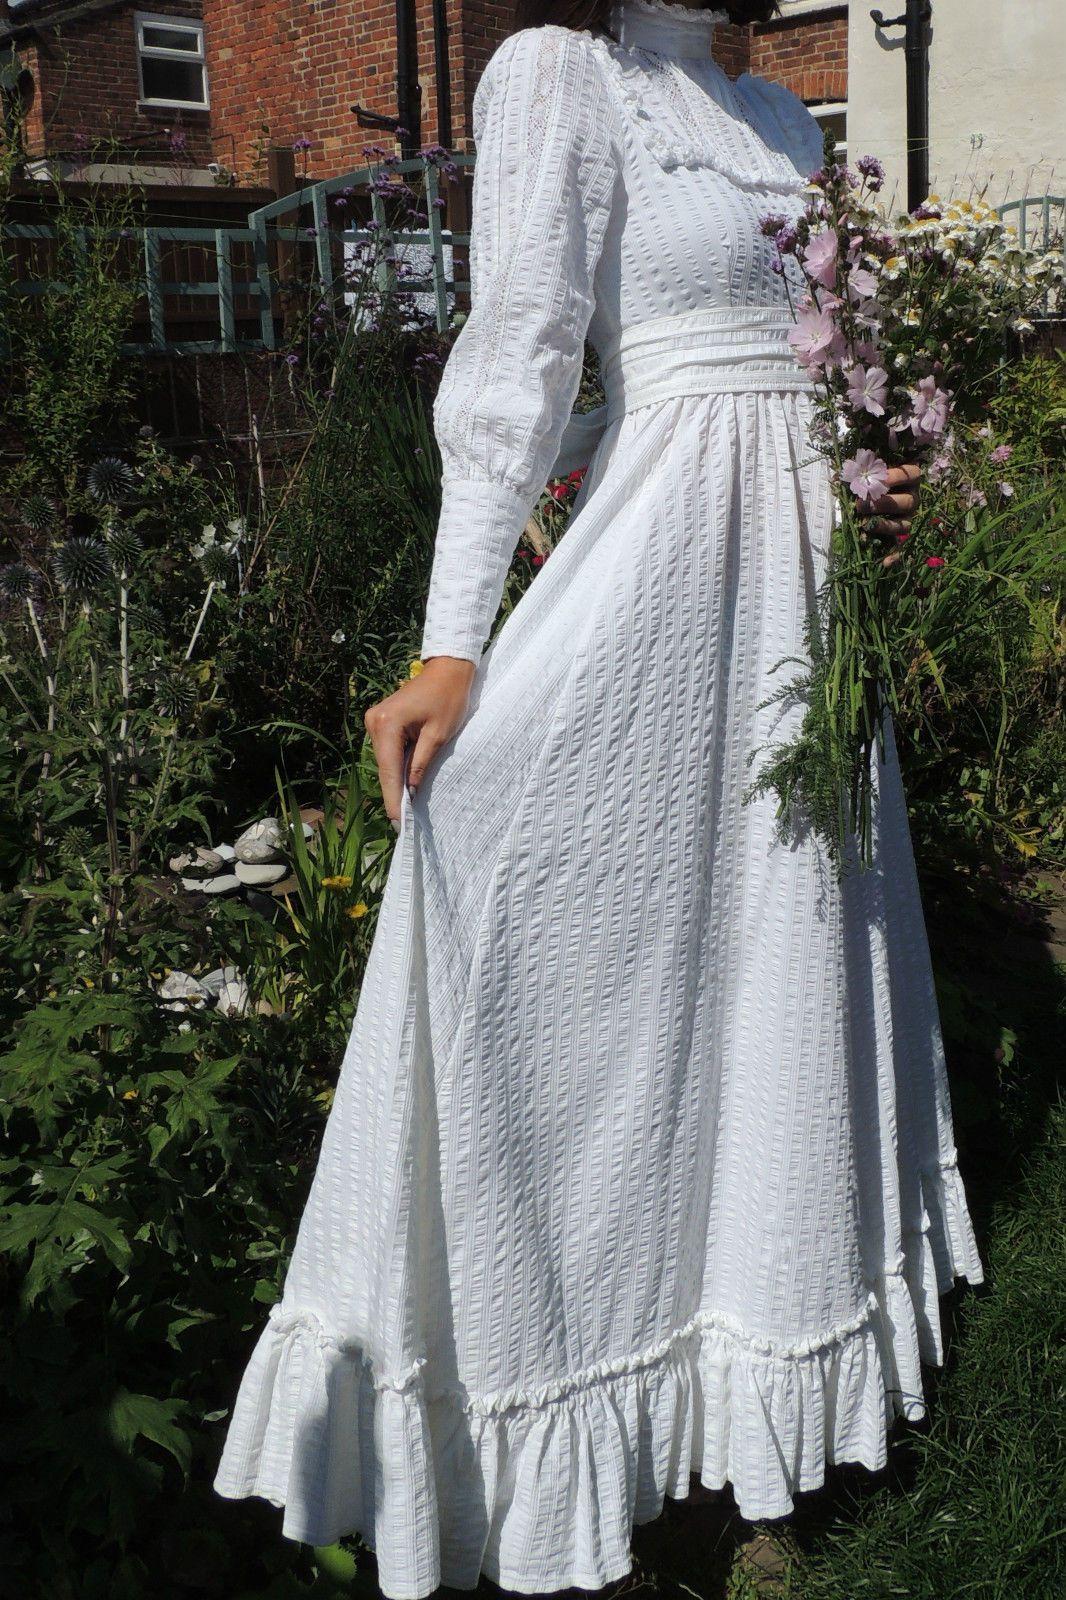 Vintage Laura Ashley Romantic Victorian Edwardian 1970s Wedding Dress Sz 8 10 Laura Ashley Dress Fancy Dresses Historical Dresses